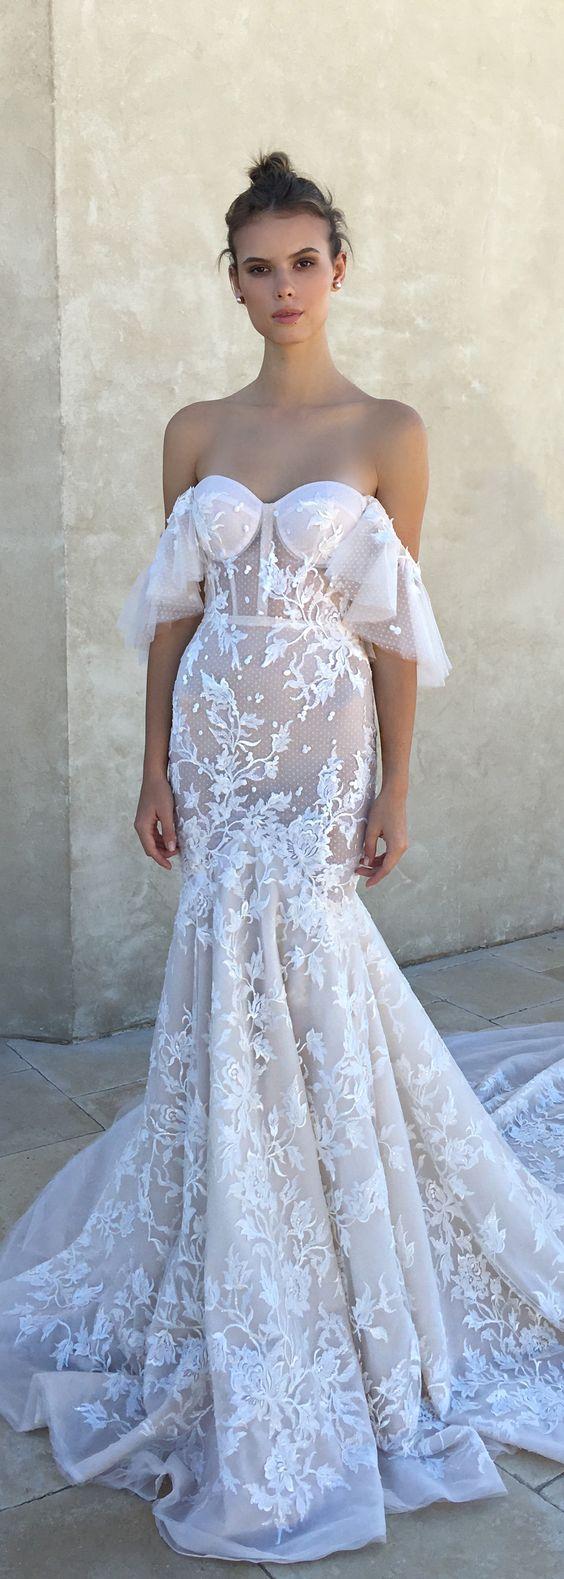 berta fw wedding dresses fall wedding dresses Berta Bridal Fall Wedding Dresses